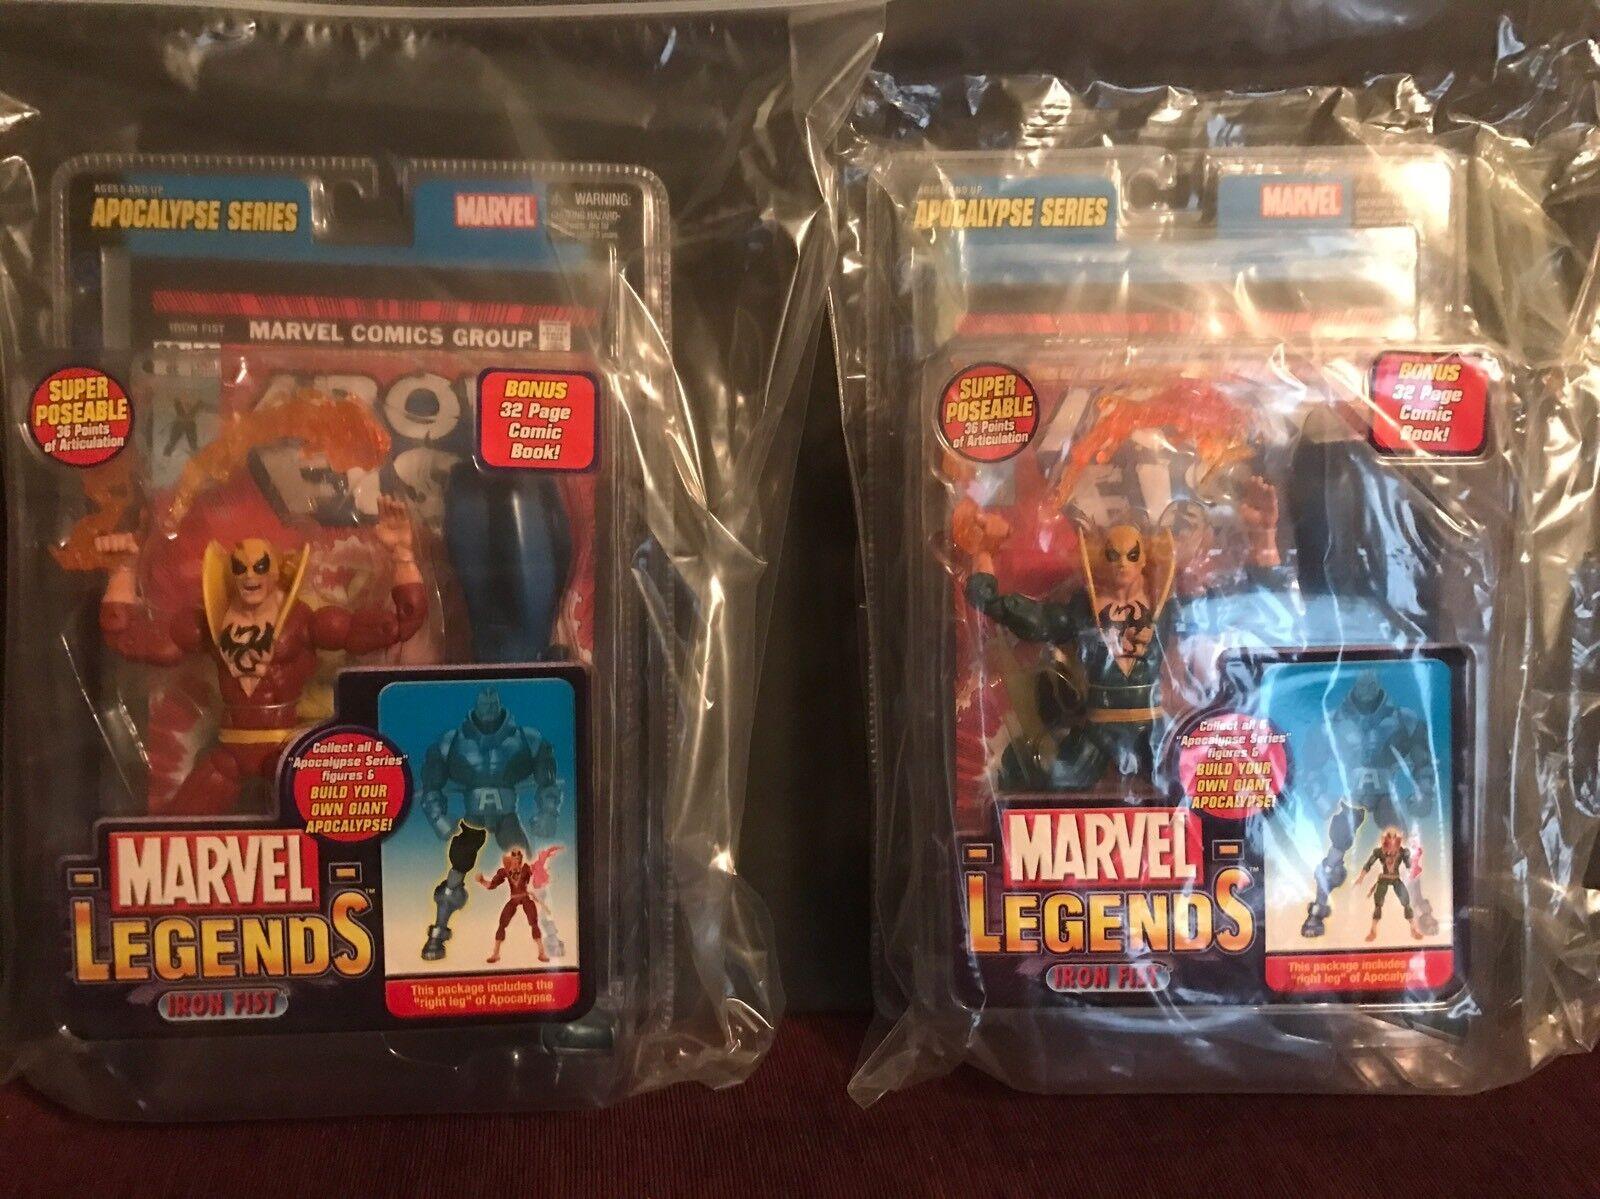 Marvel - legenden eiserne faust menge (2) variante der apokalypse